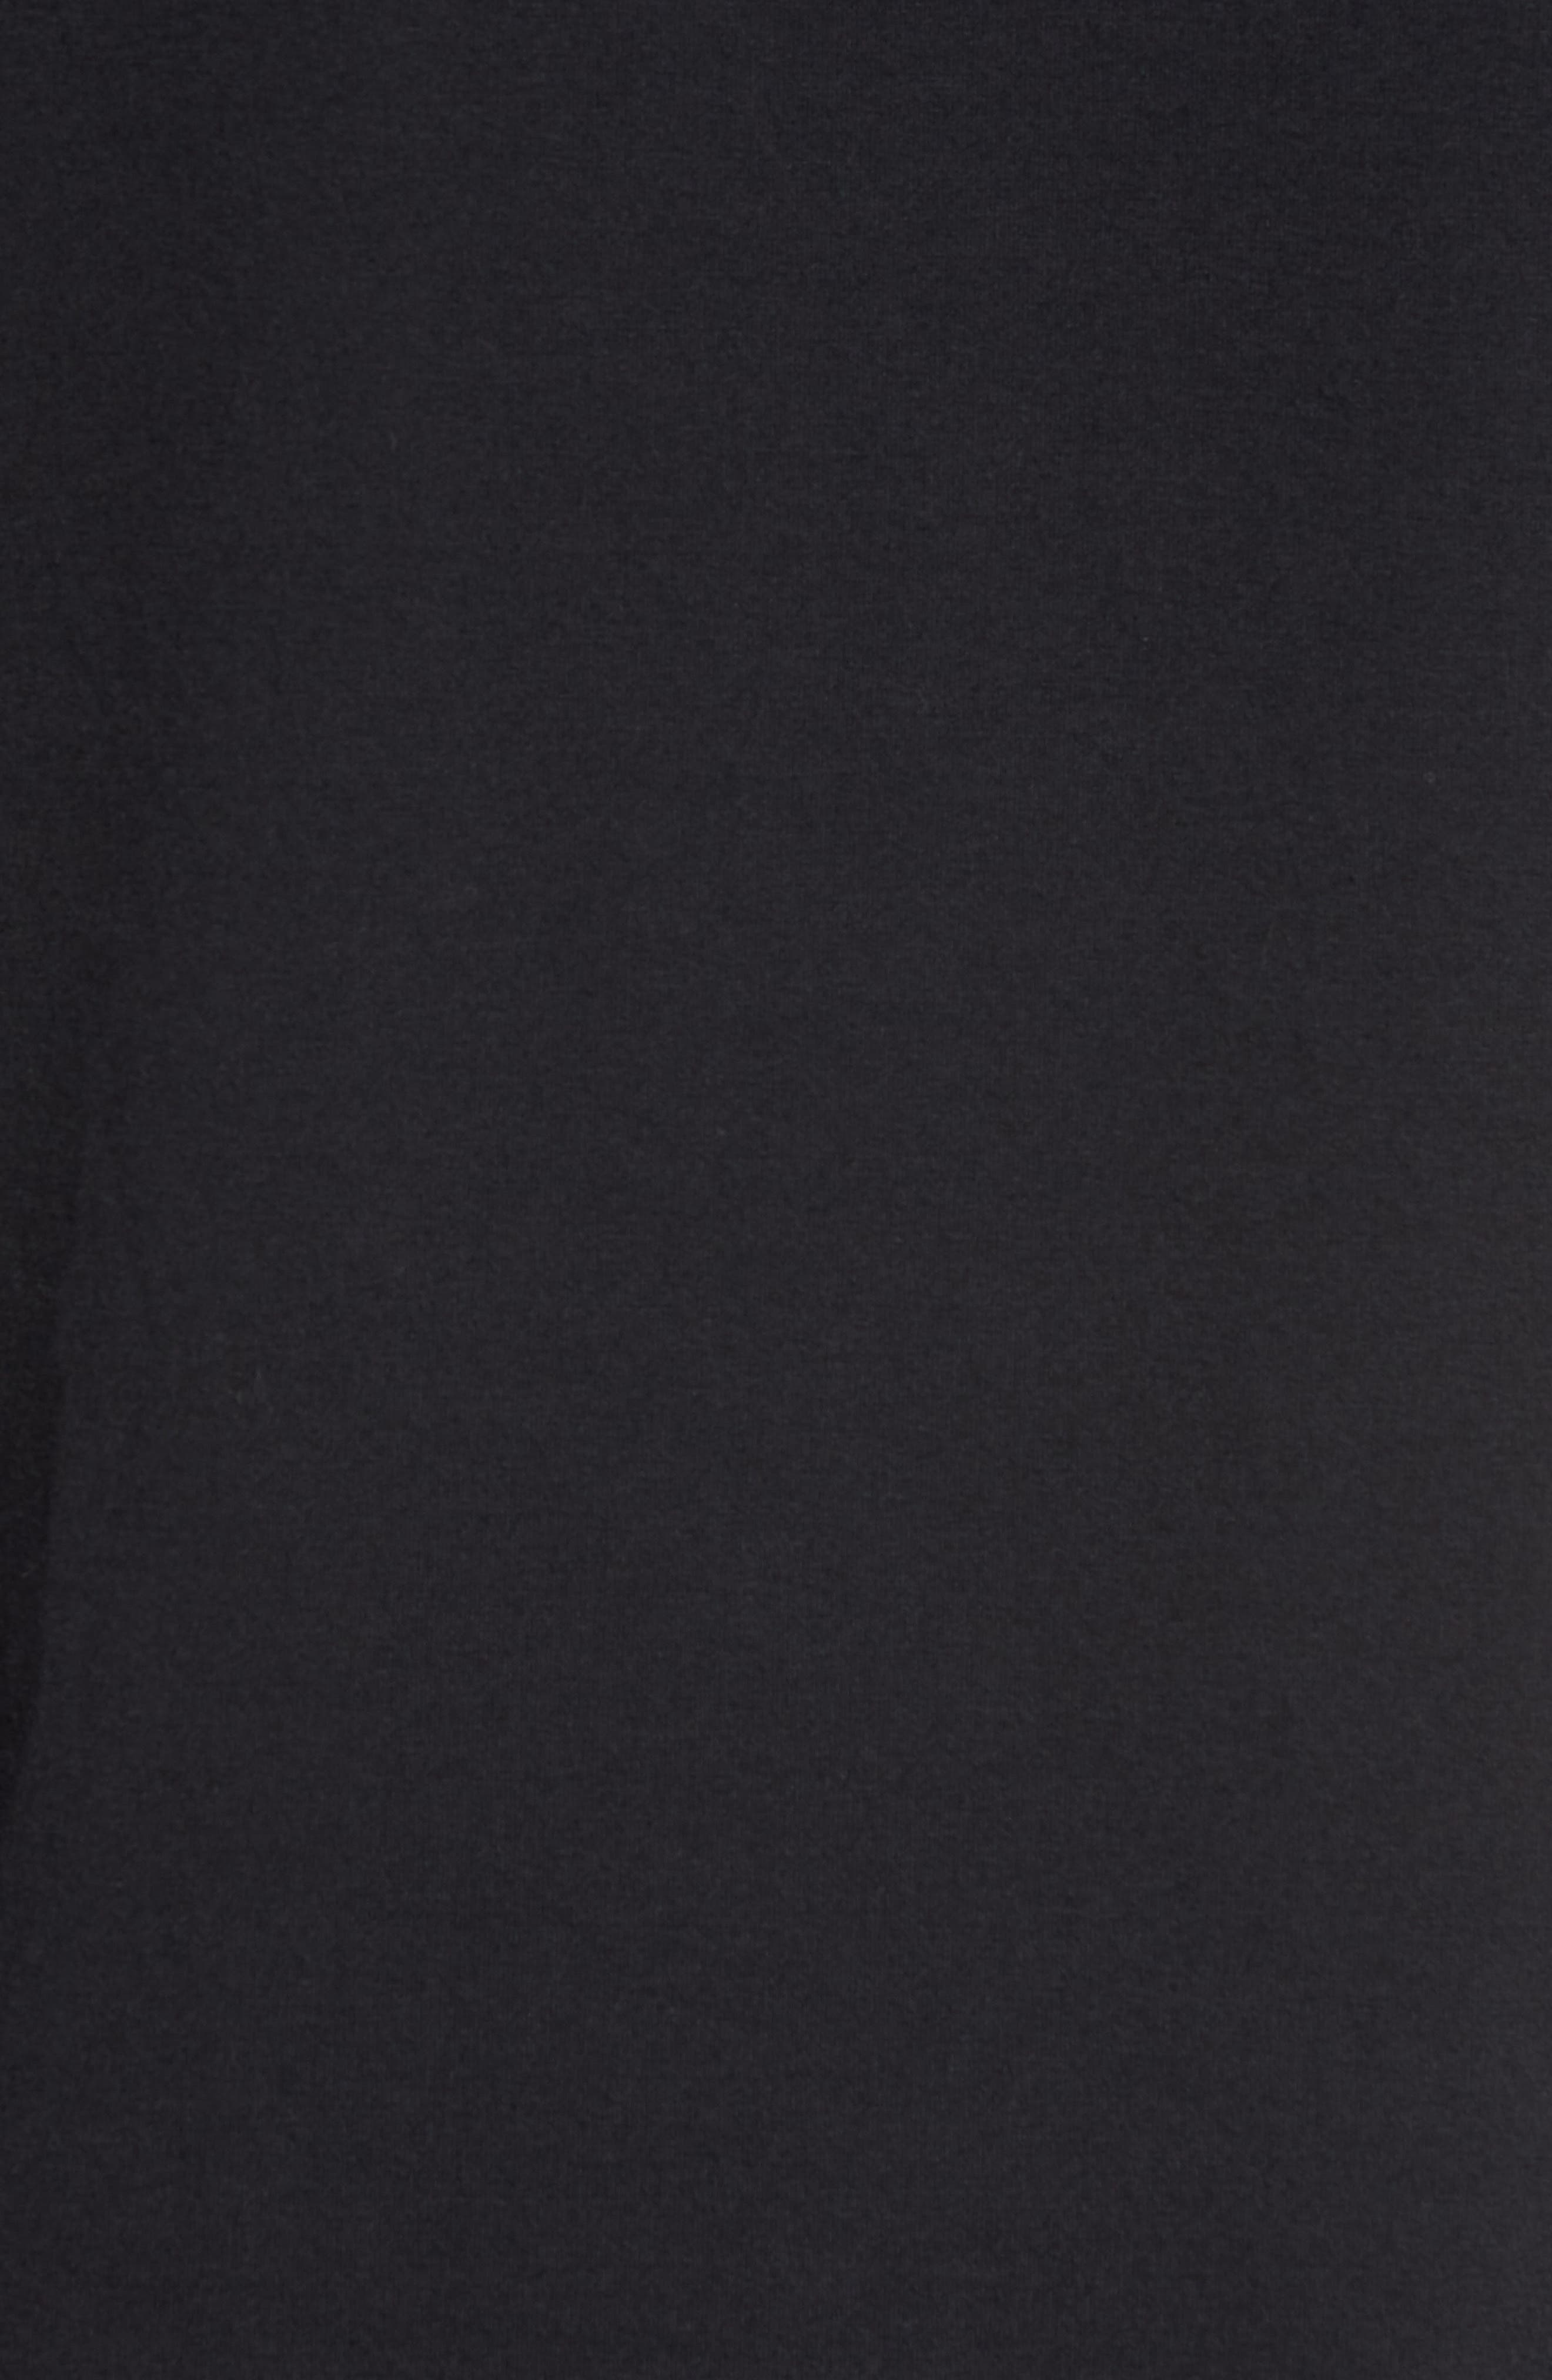 Trim Fit Vanish Logo T-Shirt,                             Alternate thumbnail 5, color,                             BLACK/ WHITE/ GRAPHITE